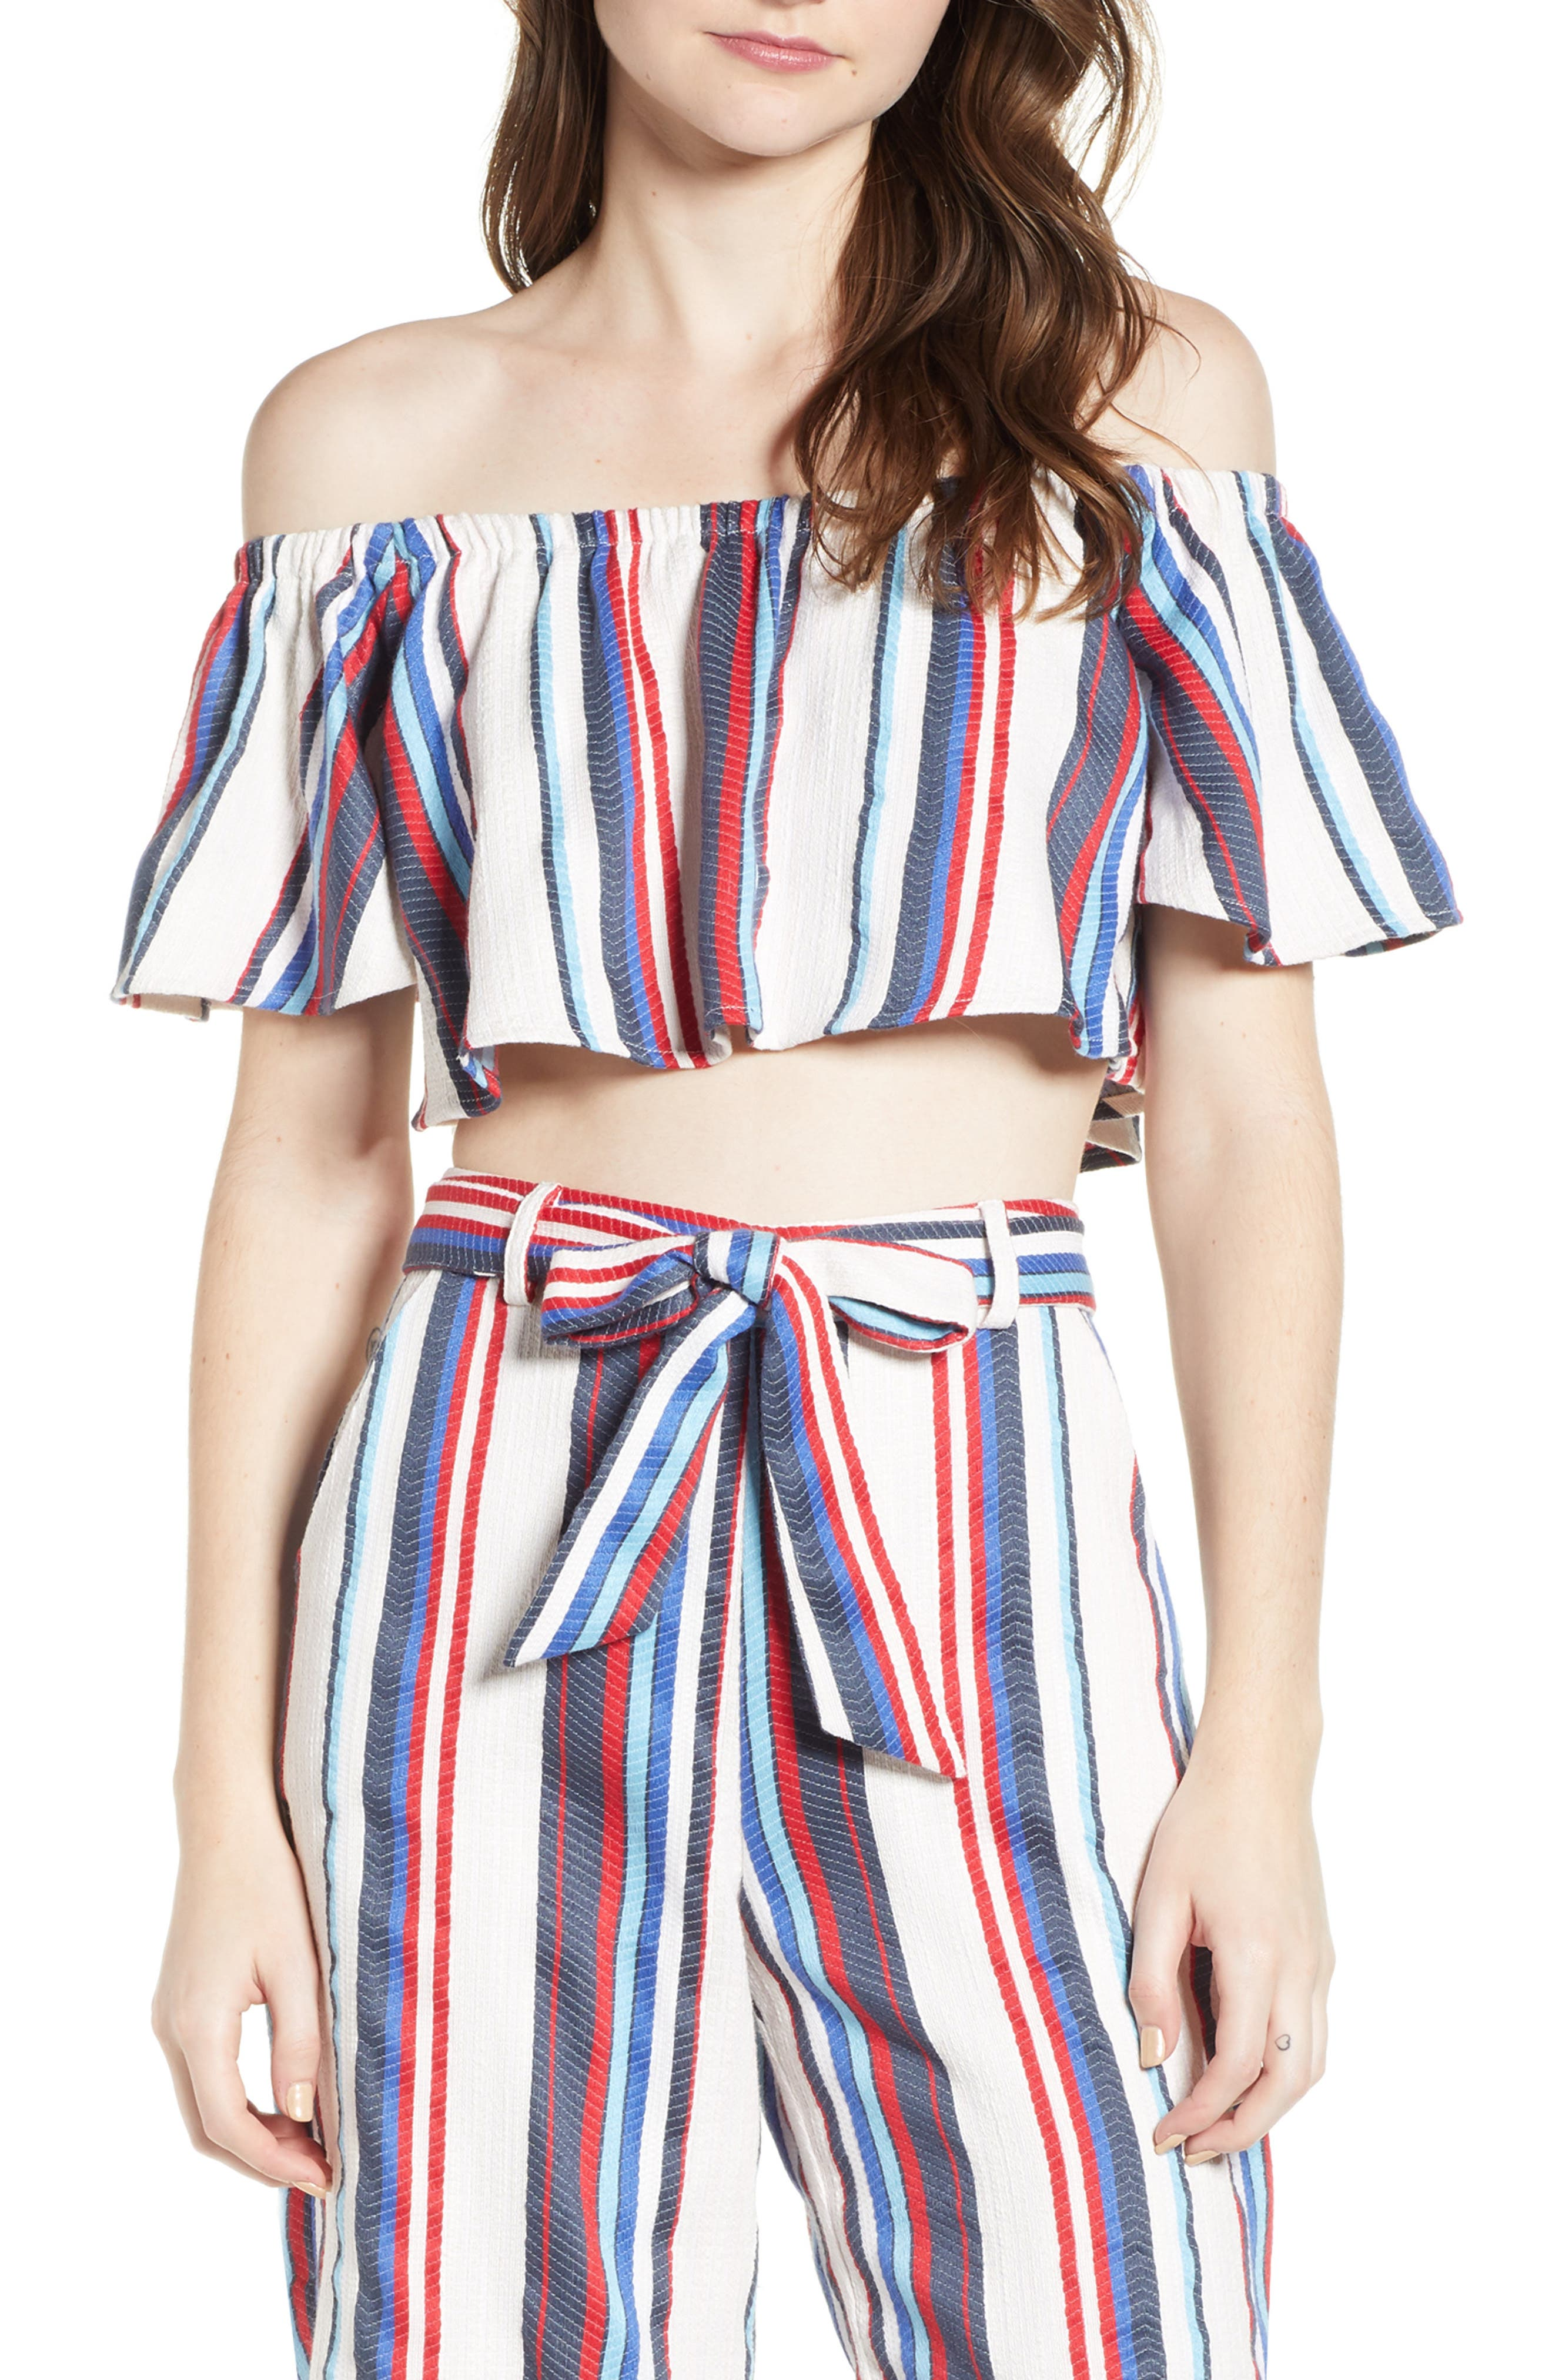 LOST + WANDER Azul Stripe Off the Shoulder Crop Top, Main, color, 400